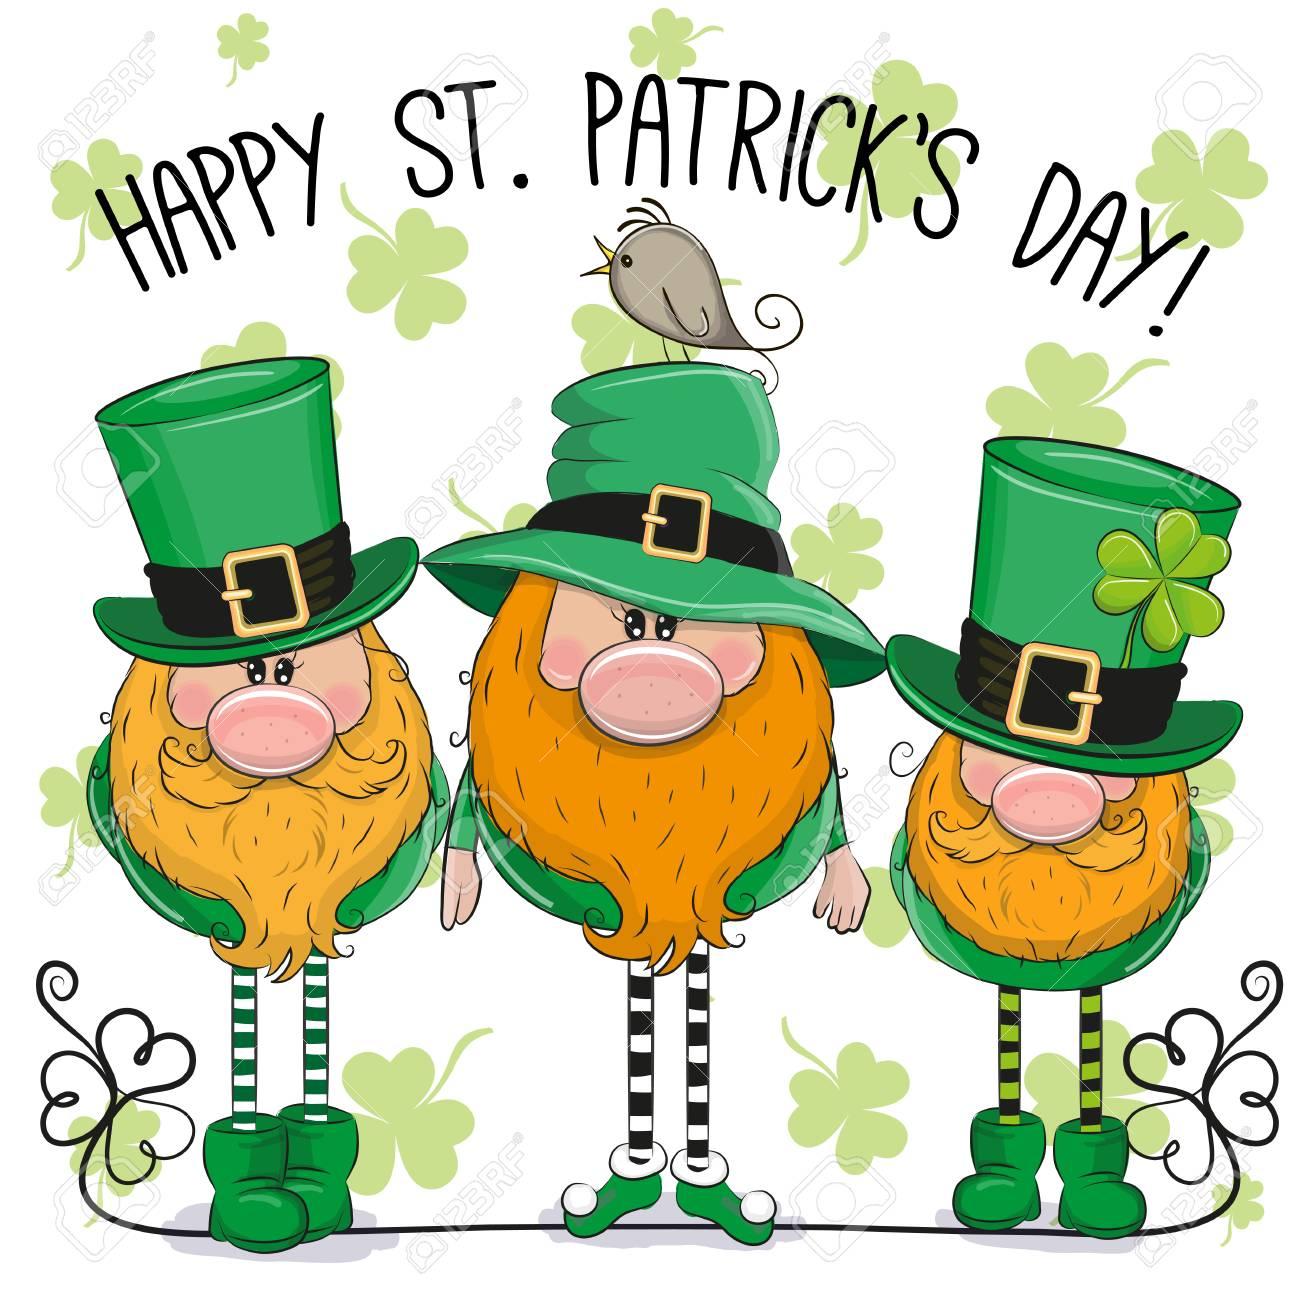 St Patricks greeting card with three cute cartoon leprechauns - 96283986